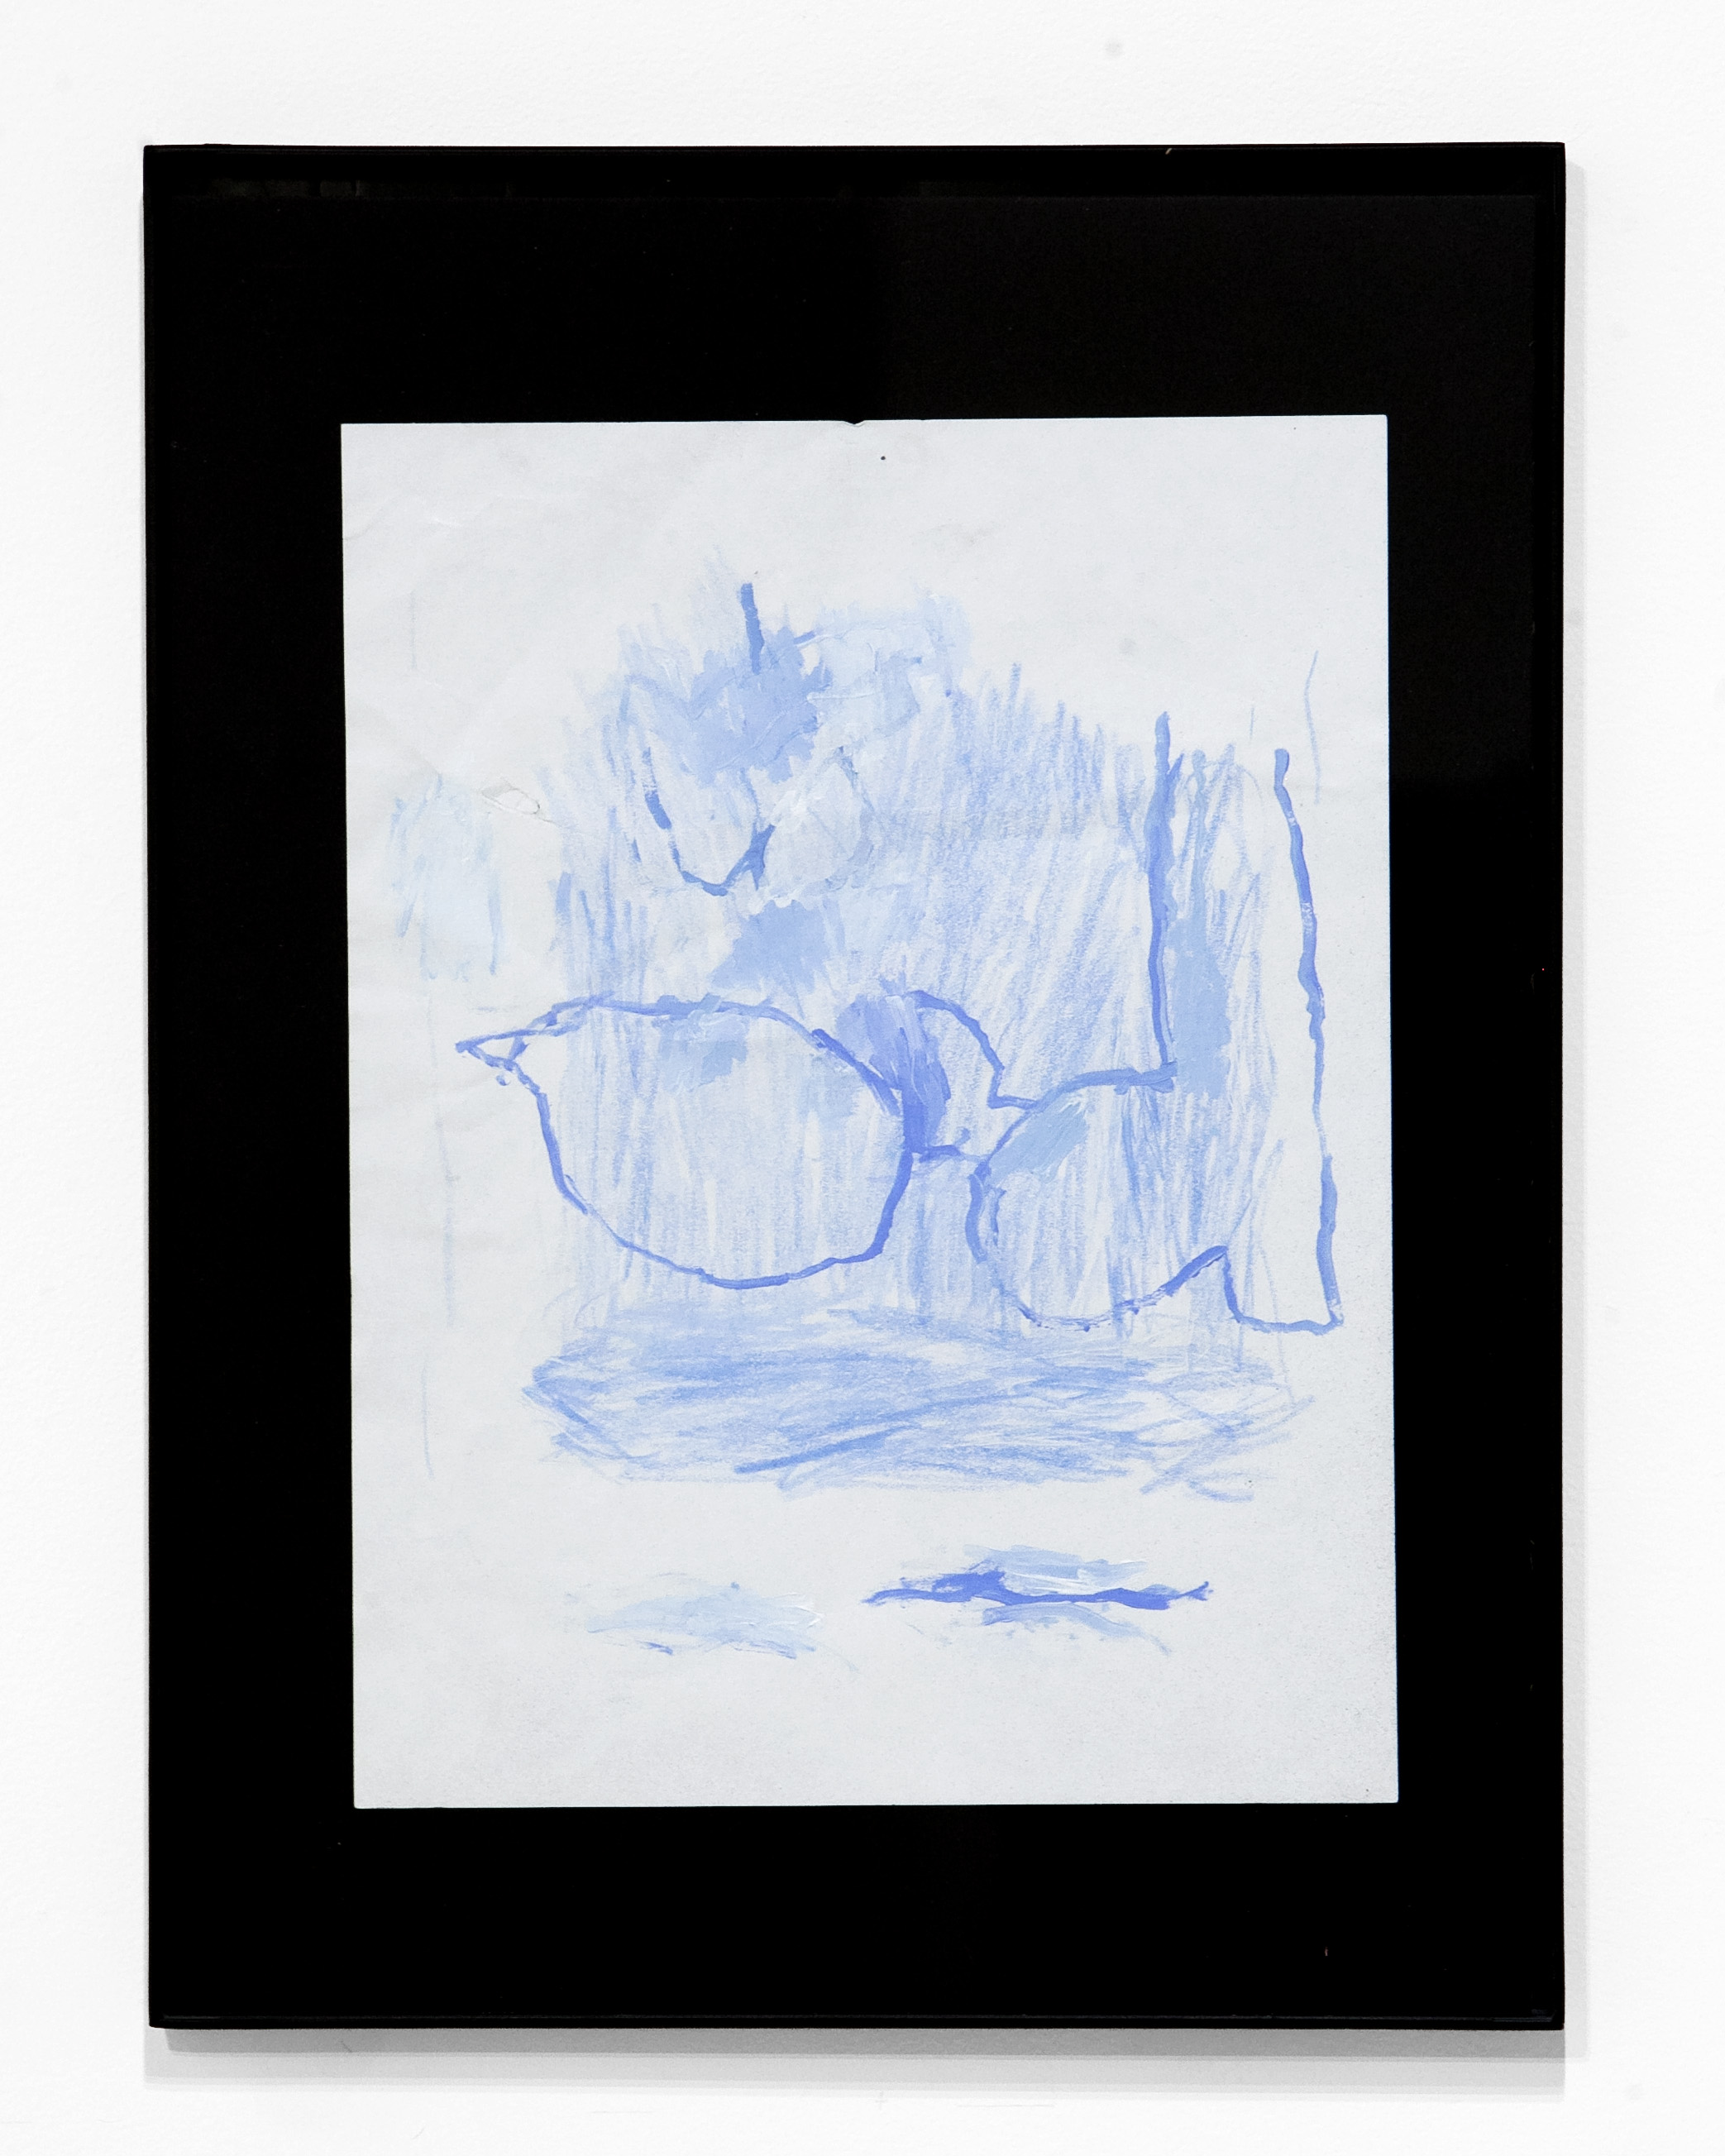 odysseuswolken_paperpiece_2.jpg